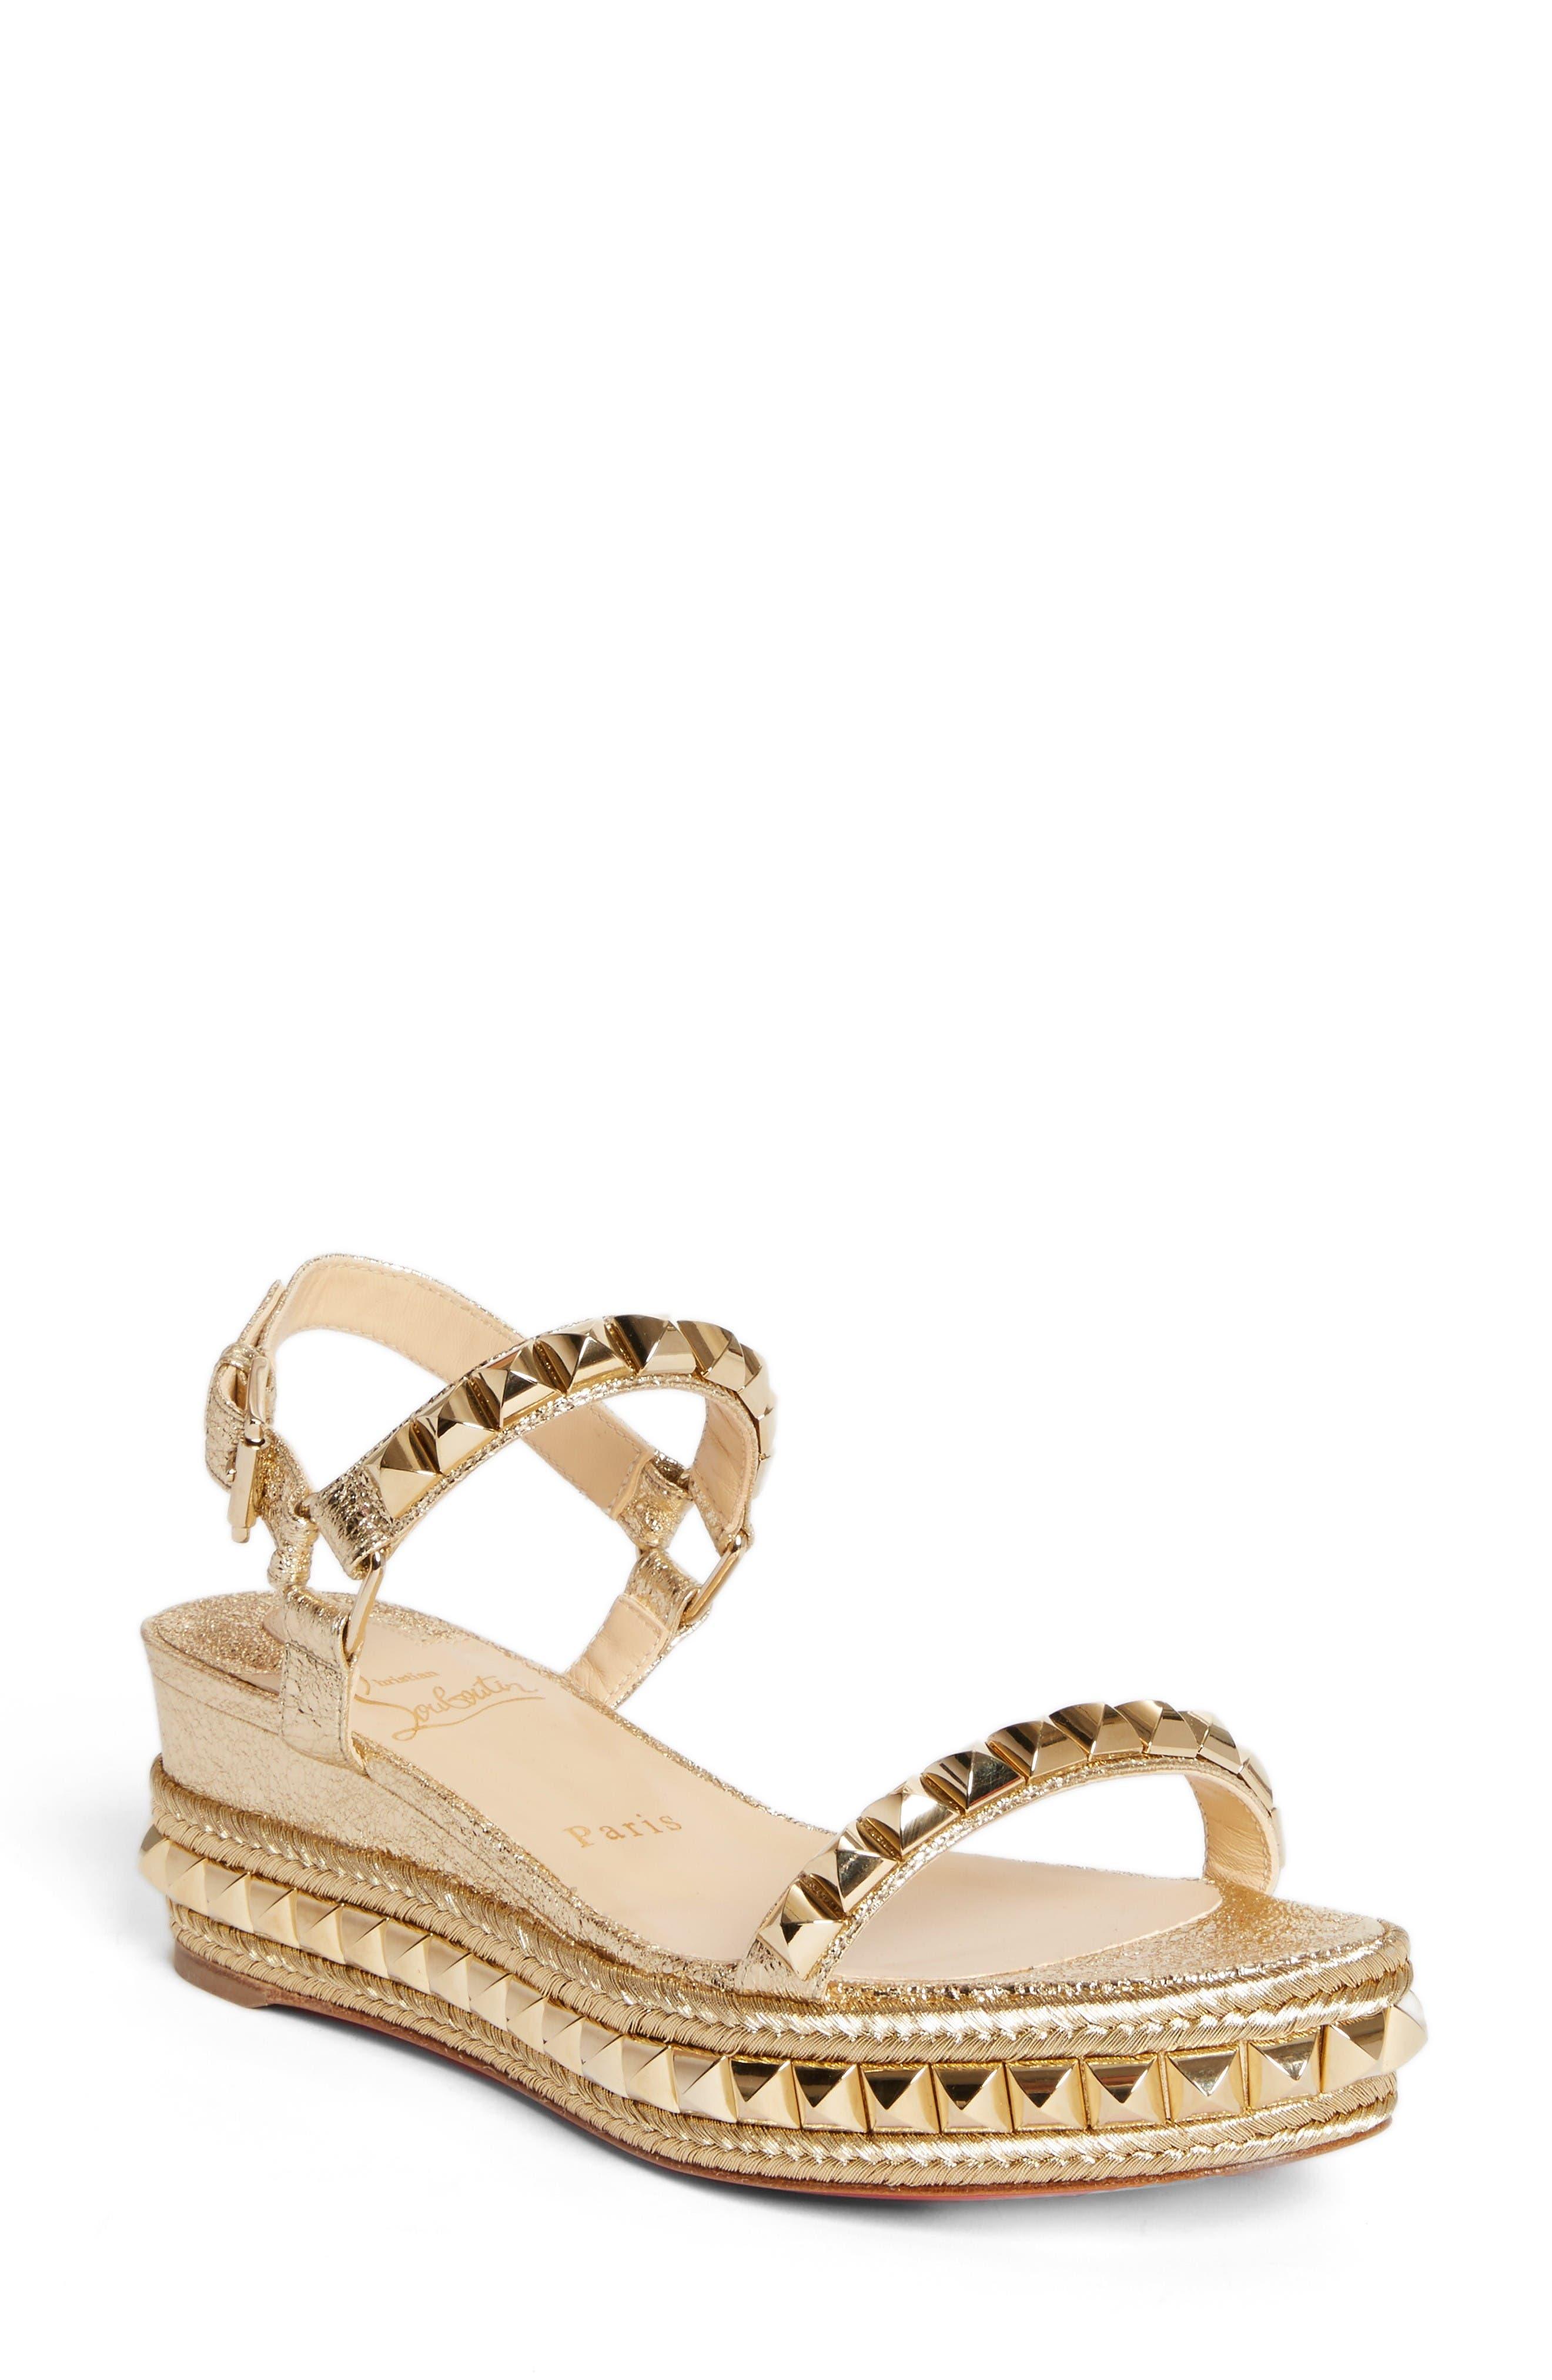 Cataclou Espadrille Wedge Sandal,                         Main,                         color, 710